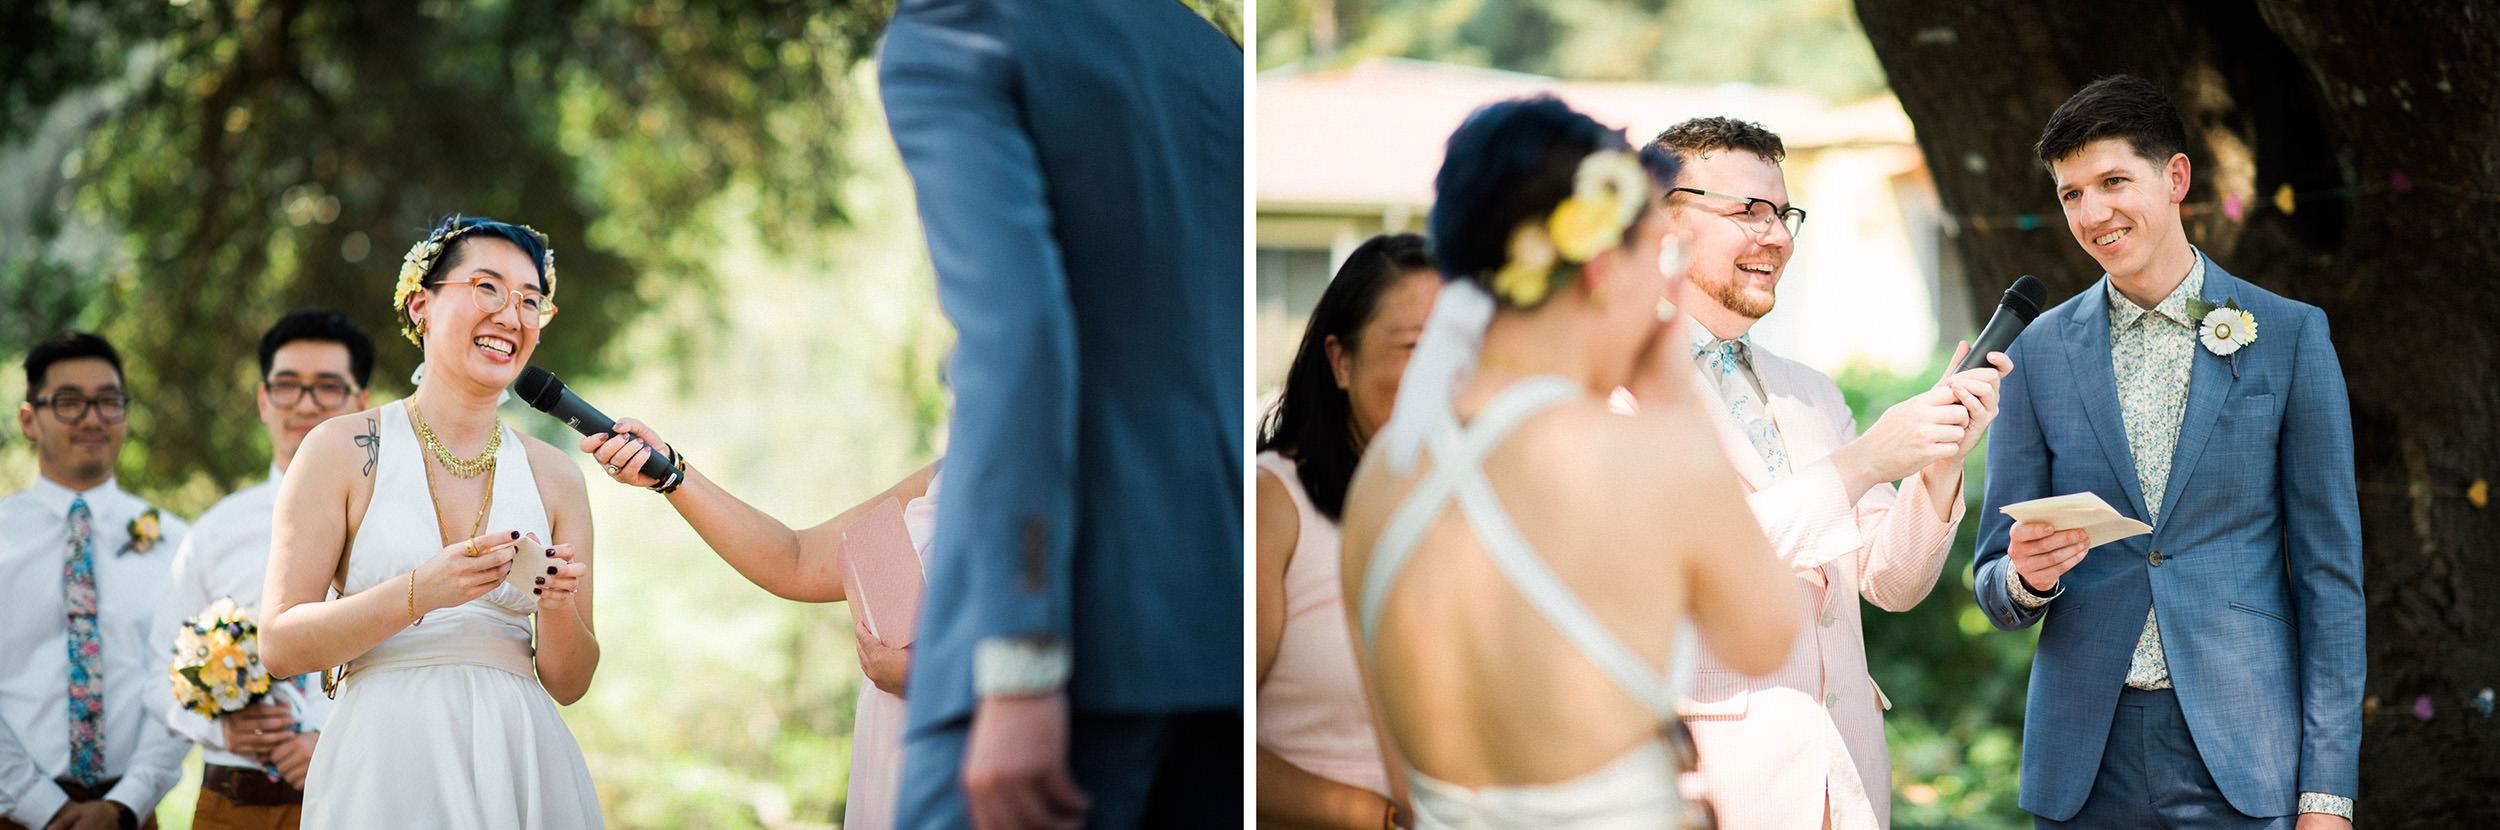 Monte Rio Community Center Wedding 033.jpg